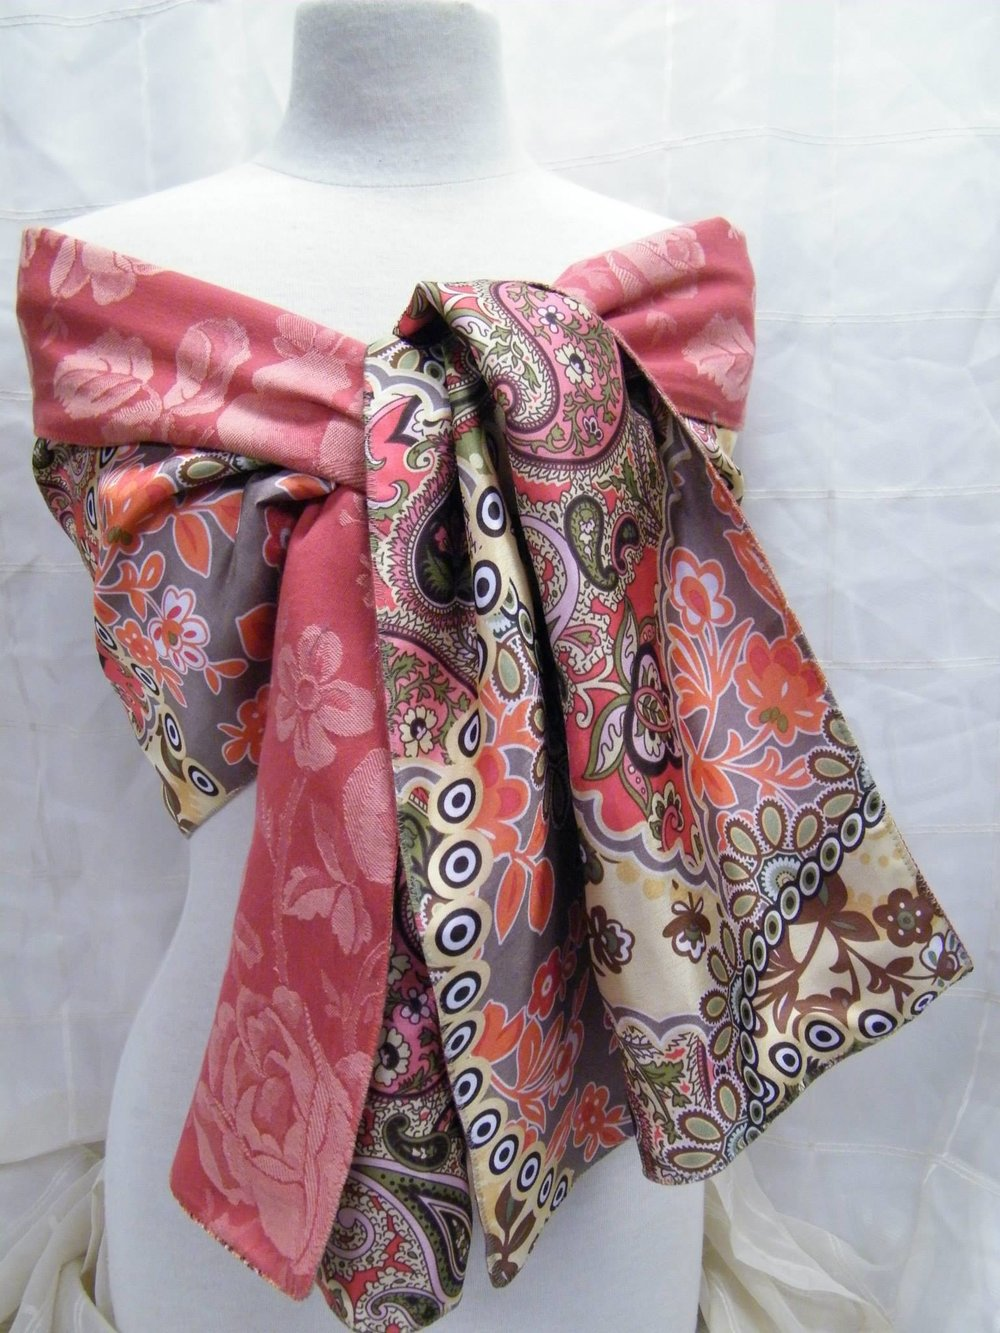 Scarlet's Wraps